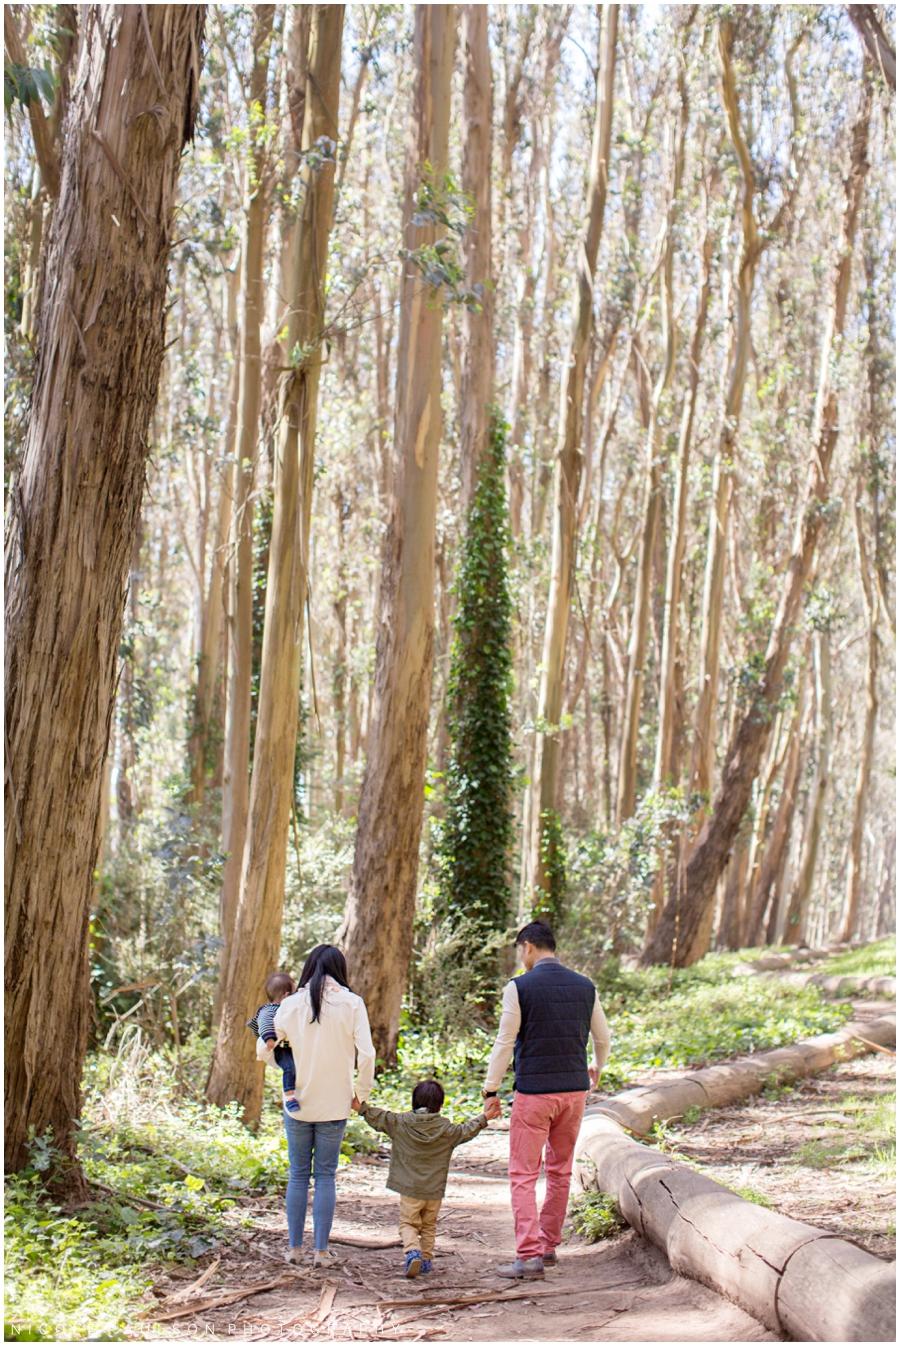 San Francisco Family Photography-Lover's Lane-Presidio-Nicole Paulson Photography_0016.jpg